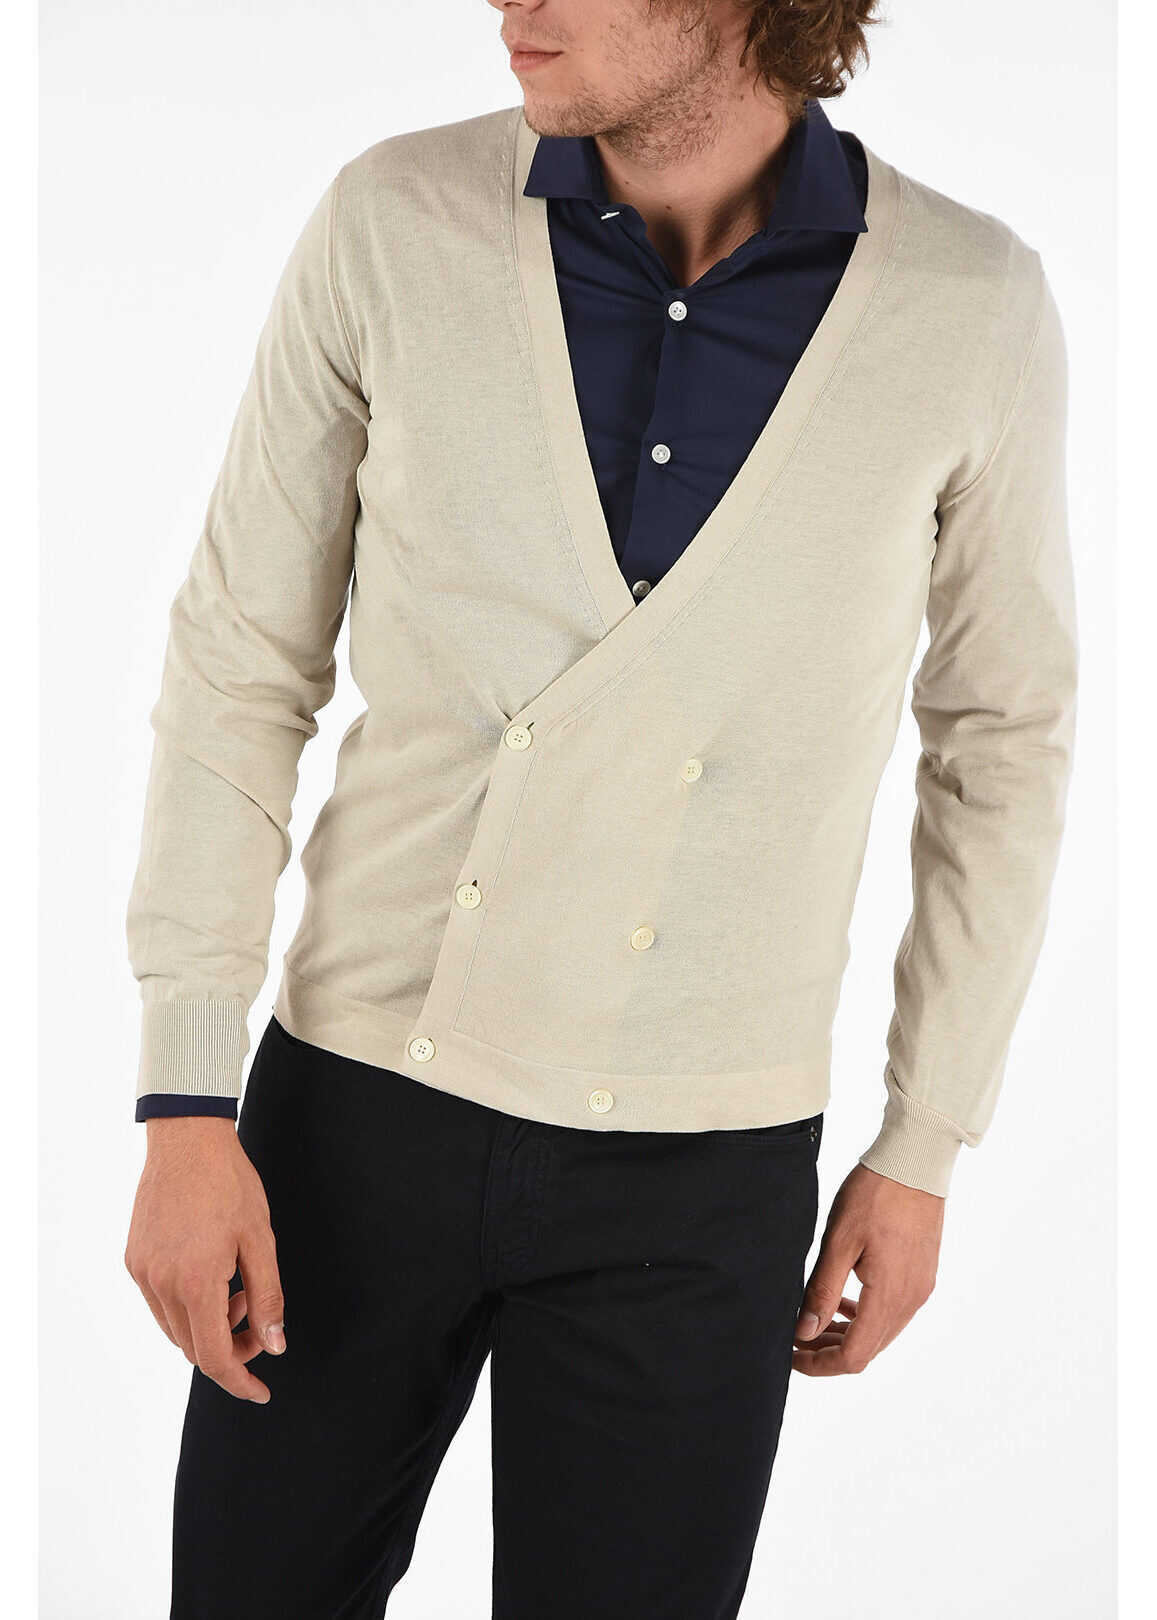 CORNELIANI ID Cotton Double Breasted Cardigan BEIGE imagine